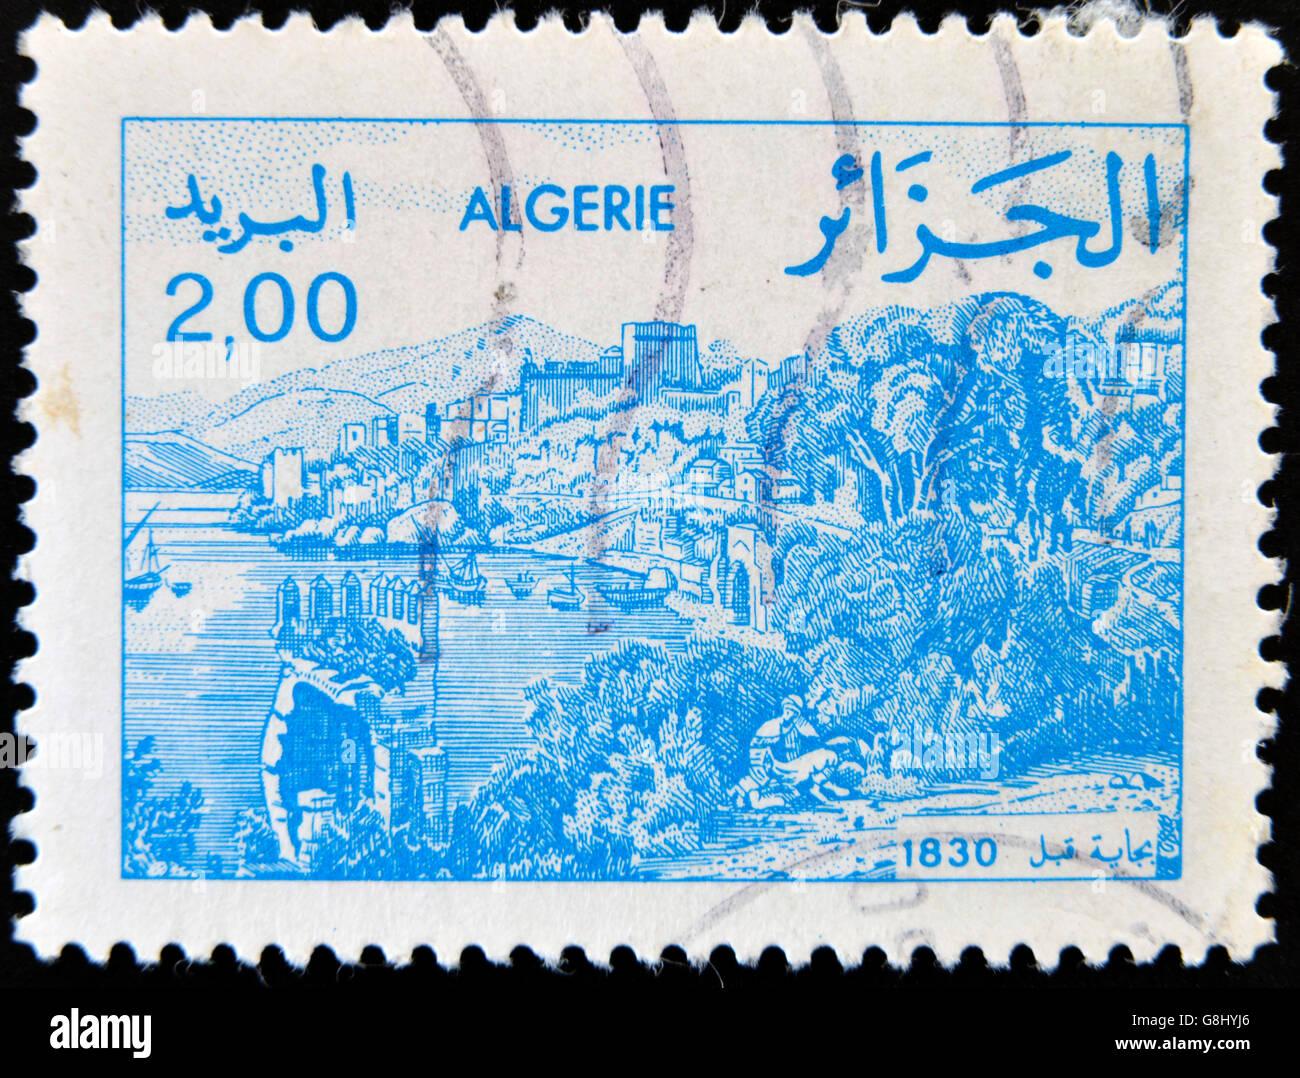 ALGERIA - CIRCA 1984: stamp printed in Algeria shows Bejaia, circa 1984 Stock Photo